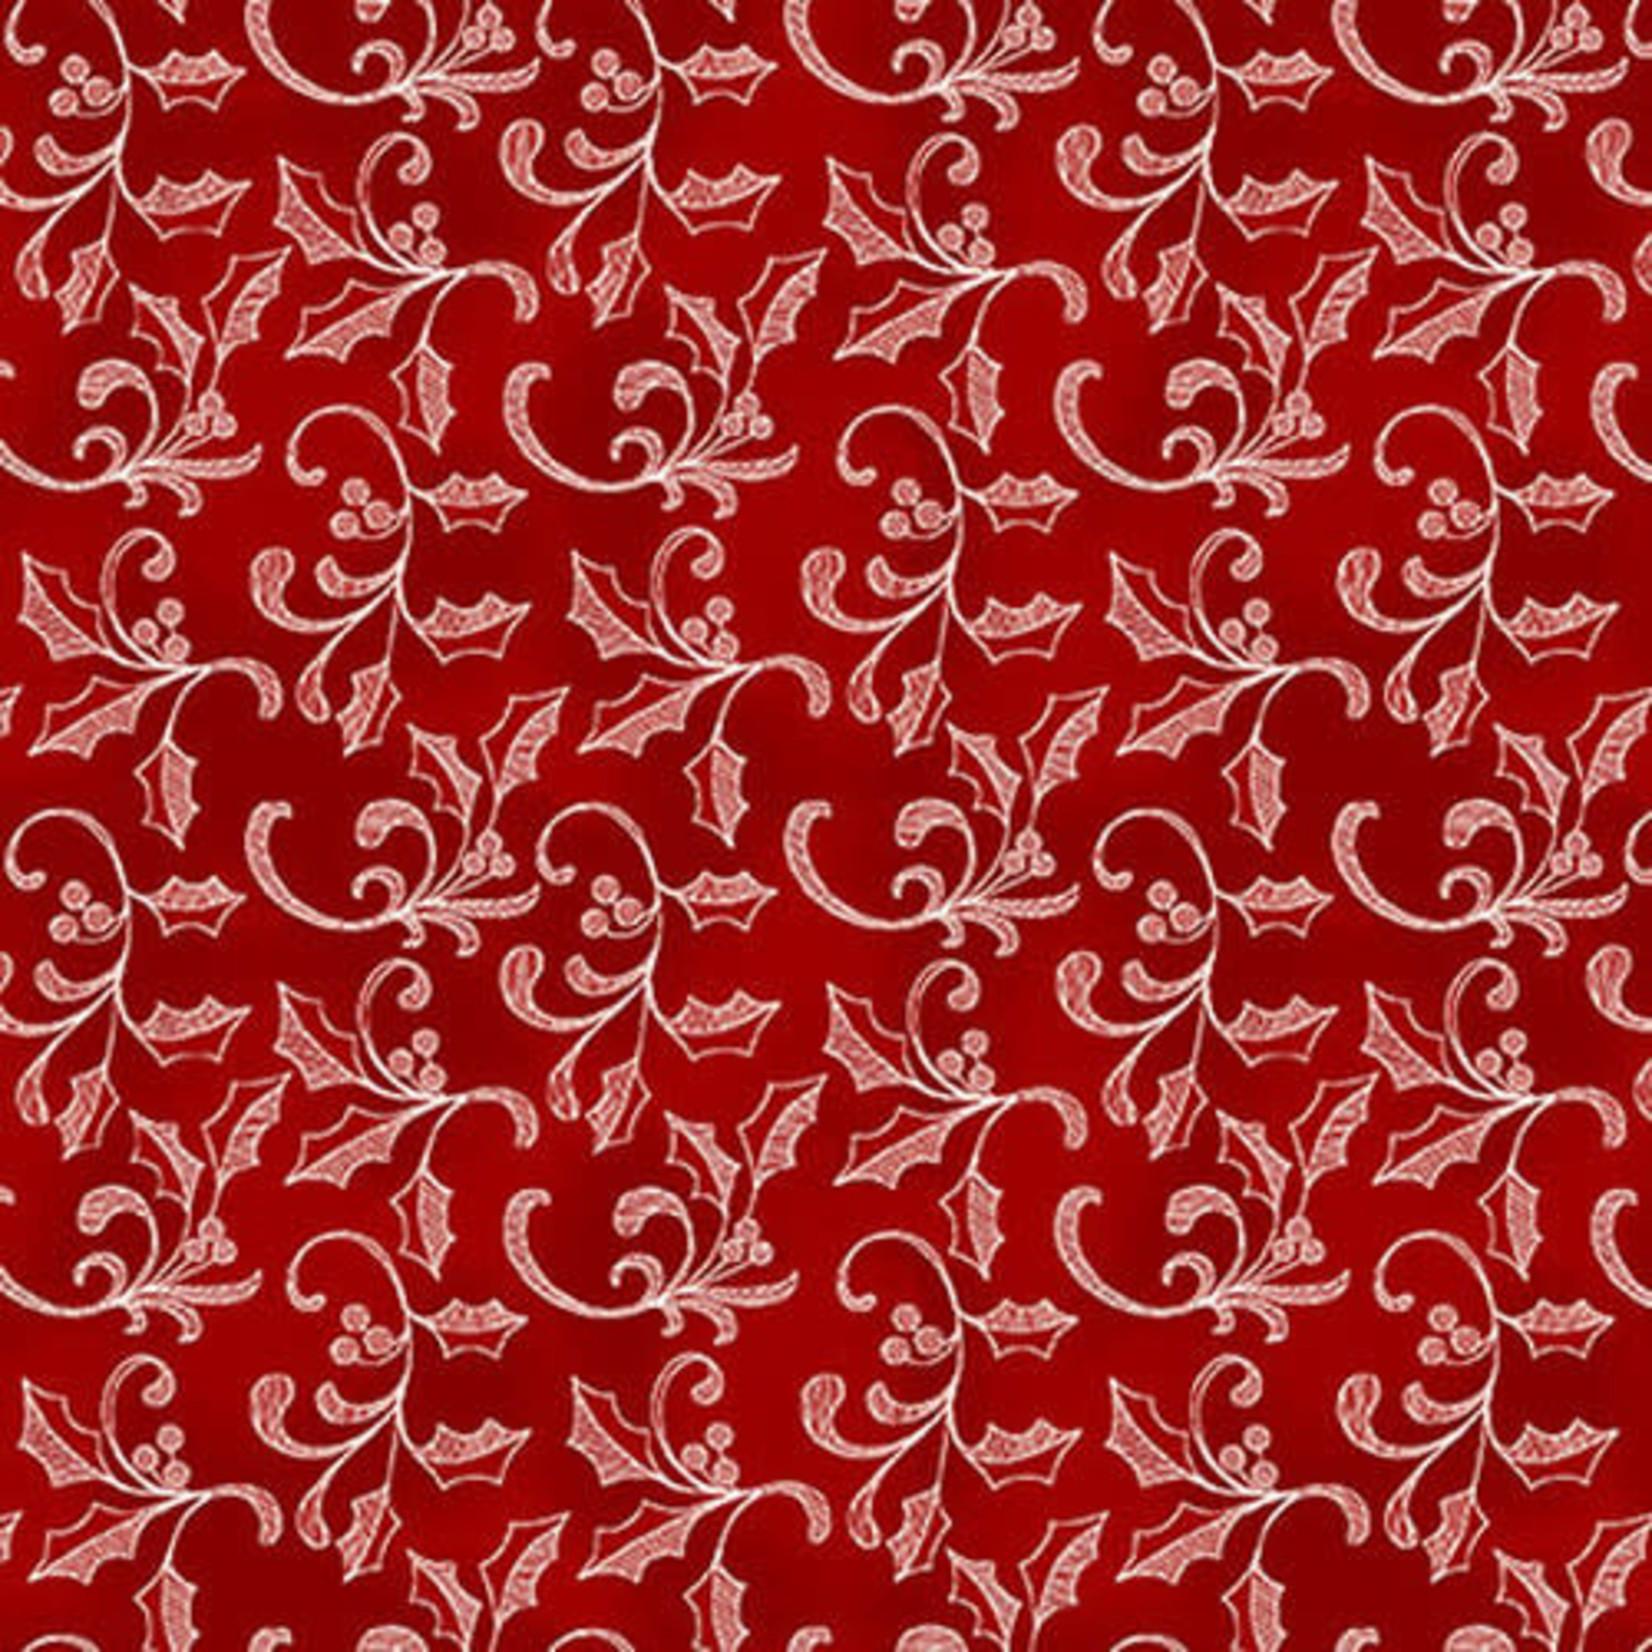 StudioE Fabrics Home For The Holidays - Red